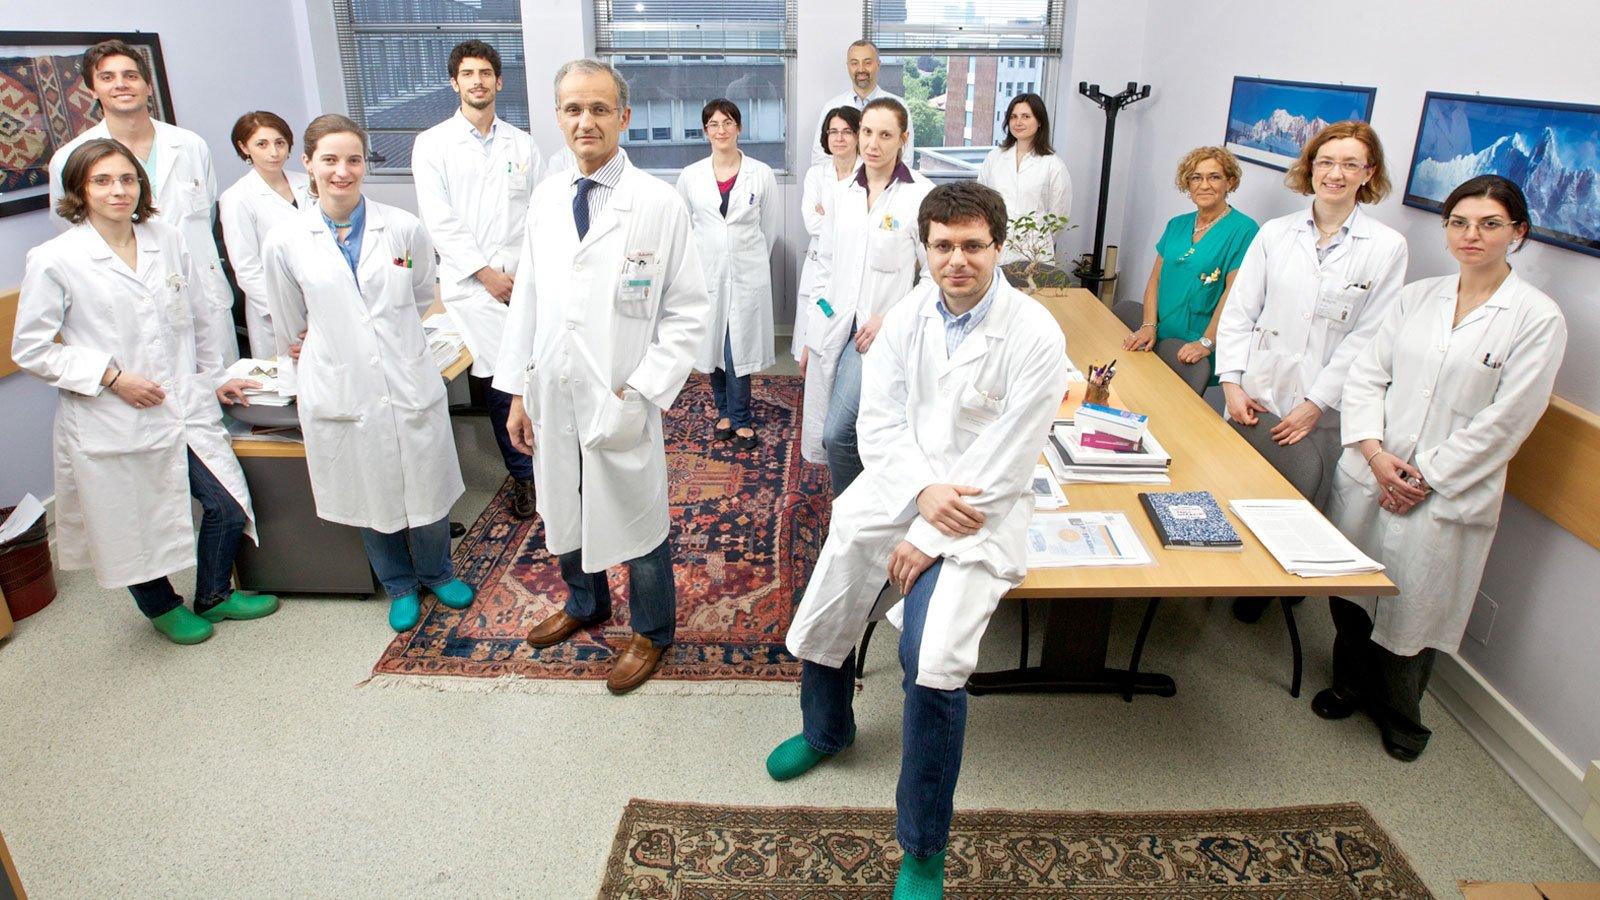 Team Ematologia Istituto Nazionale Tumori